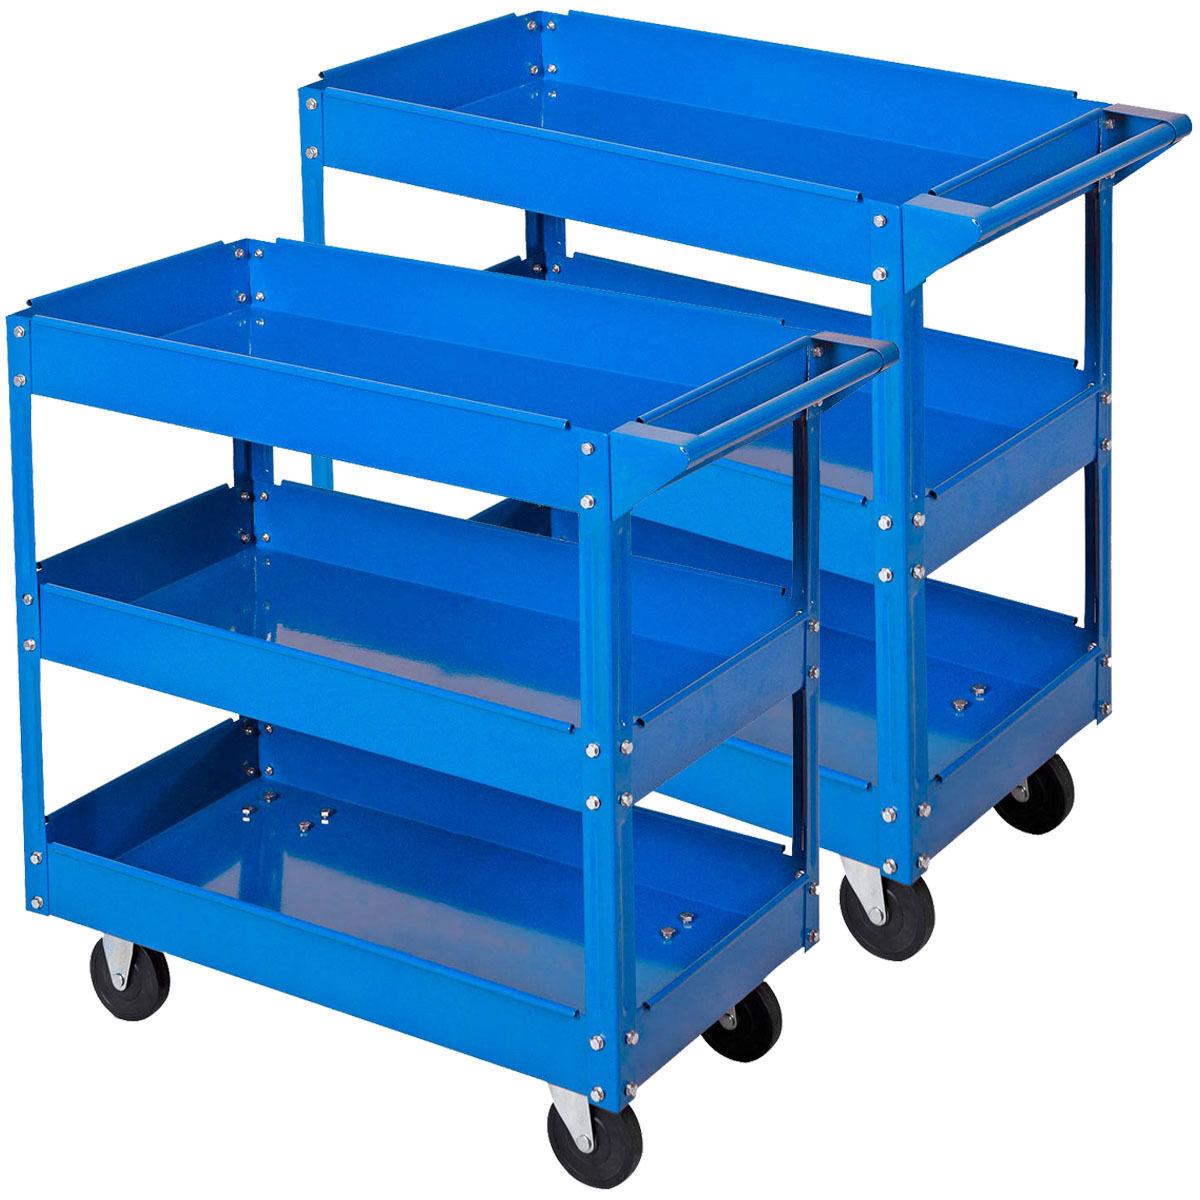 2xheavy duty workshop garage diy tool storage trolley wheel cart tray 3 tier ebay. Black Bedroom Furniture Sets. Home Design Ideas